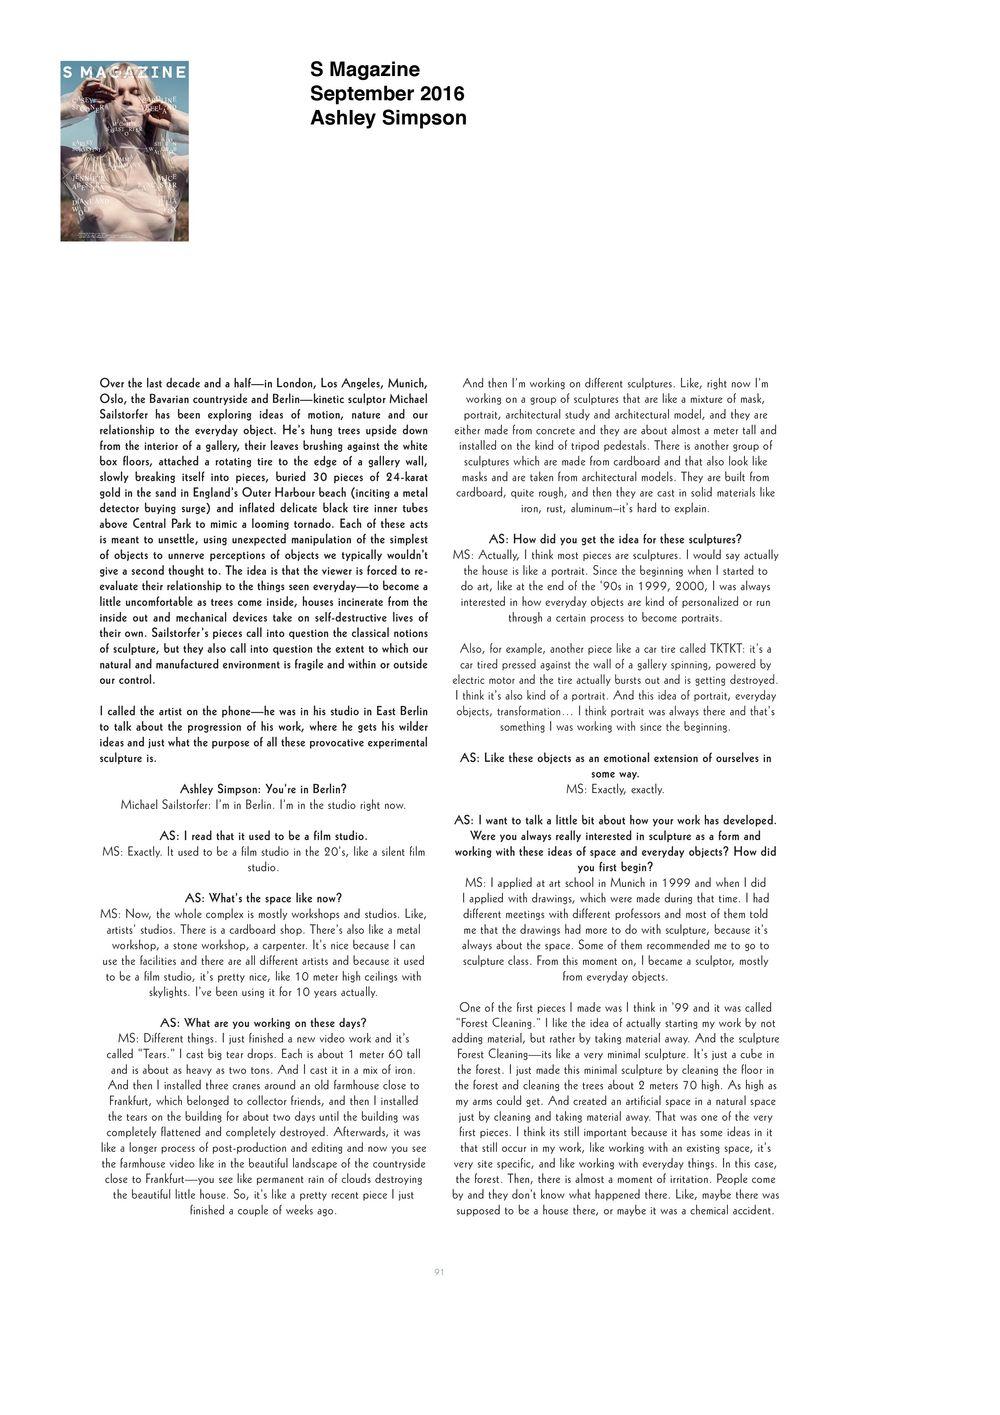 S Magazine  | Michael SAILSTORFER